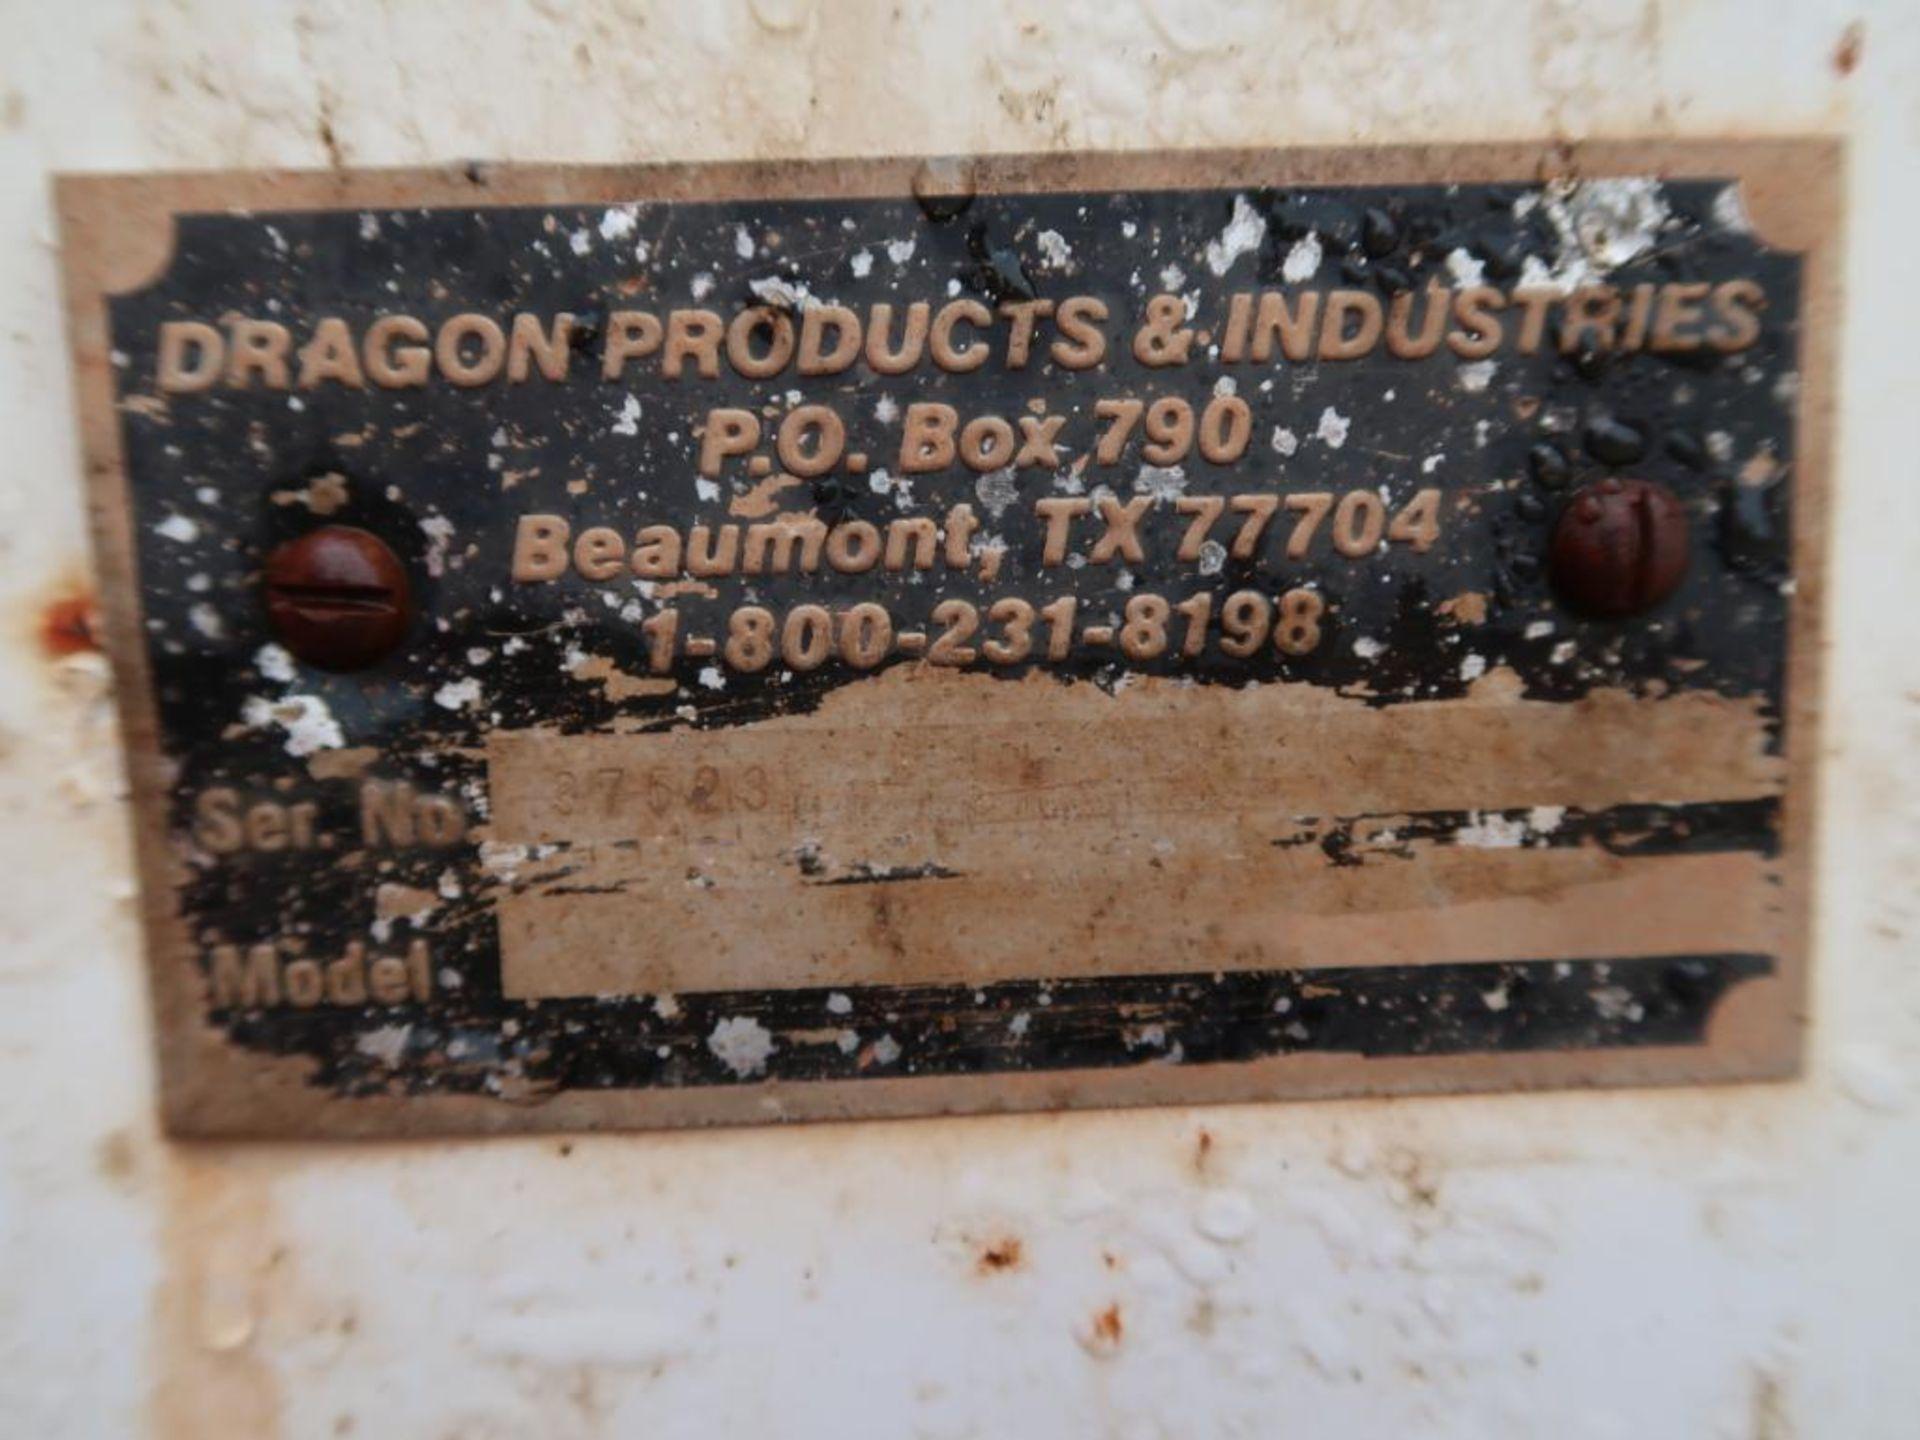 Lot 55 - Dragon Vacuum Trailer (AS IS), 130 BBL, ID # 37523, Unit VT18